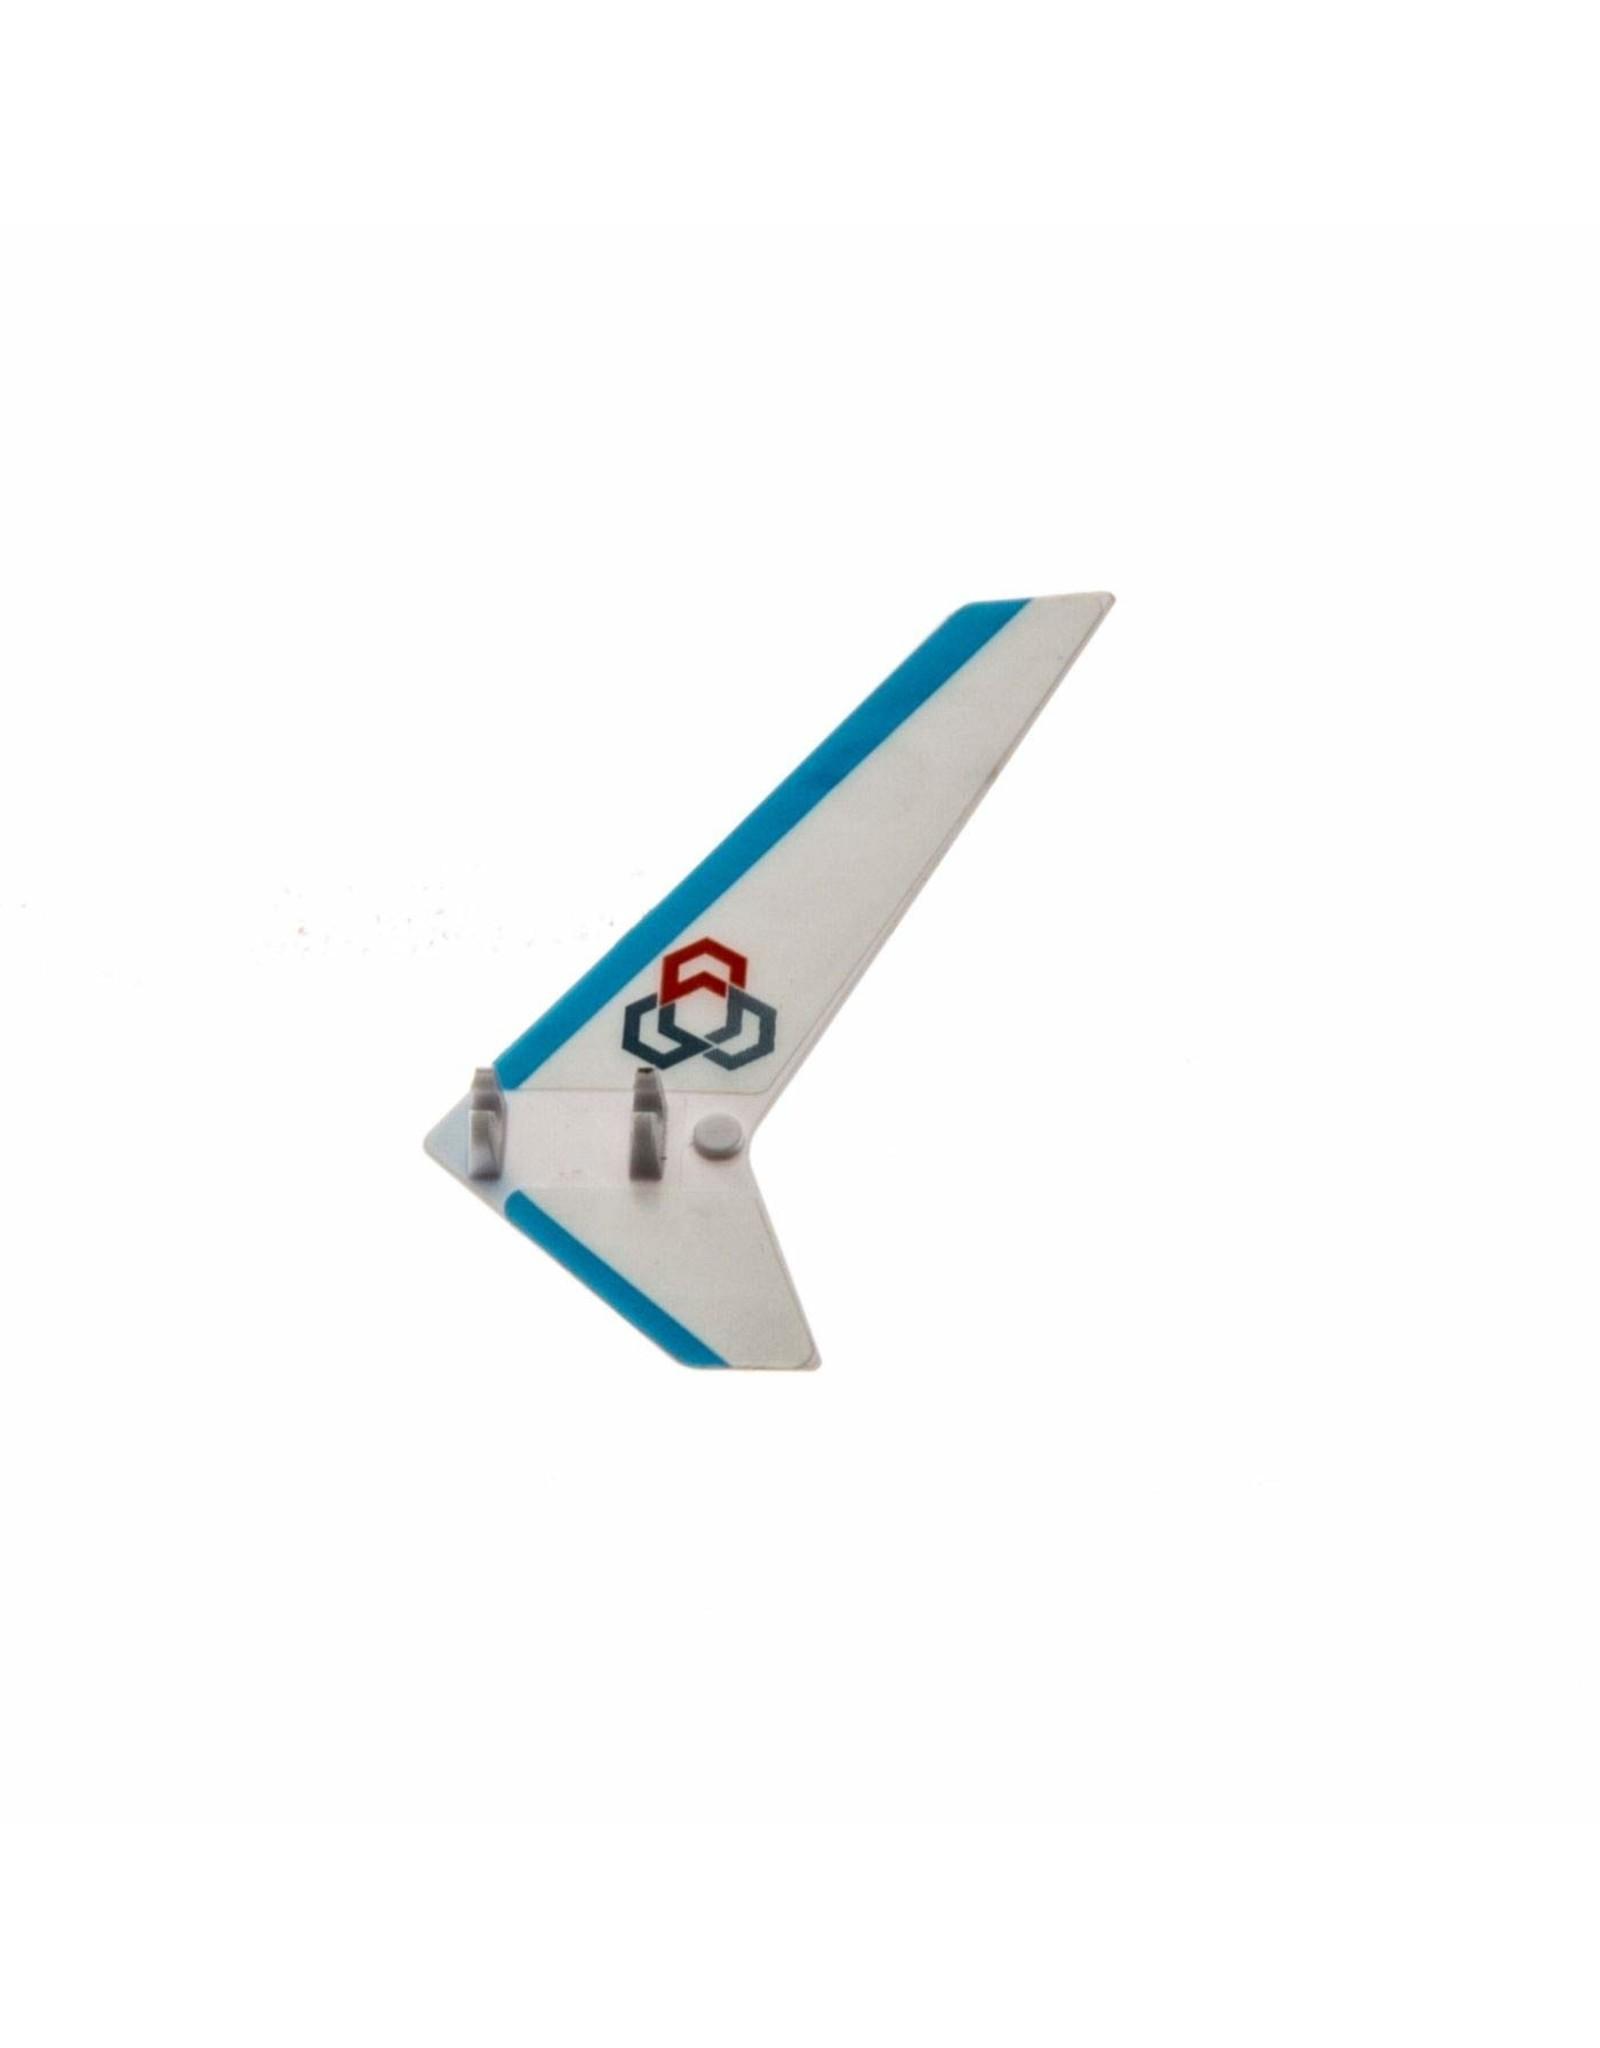 Blade 1304 - Vertical Tail Fin: Nano S2